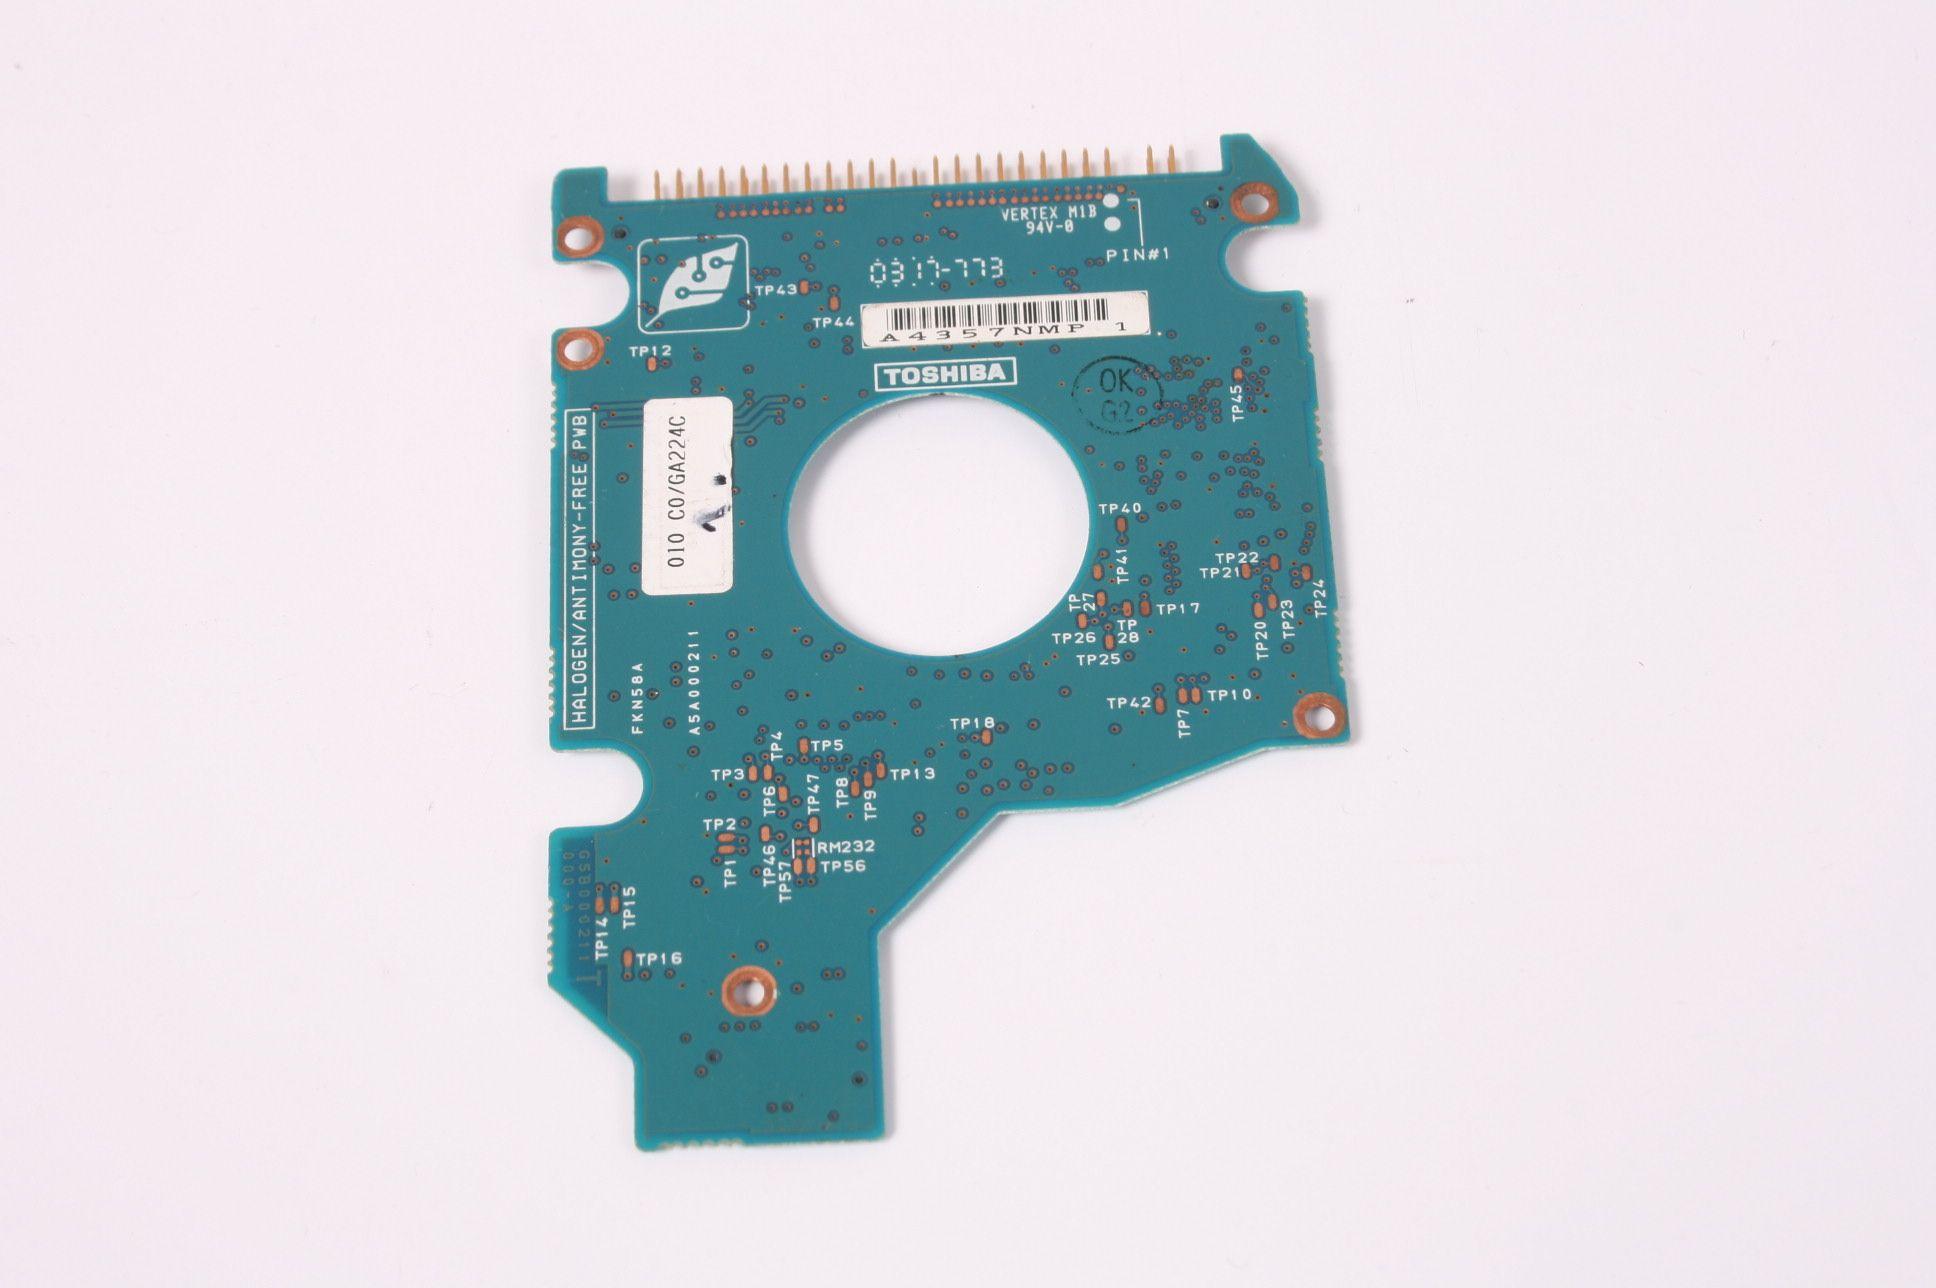 TOSHIBA MK4021GAS 40GB 2.5 IDE HARD DRIVE / PCB (CIRCUIT BOARD) ONLY FOR DA